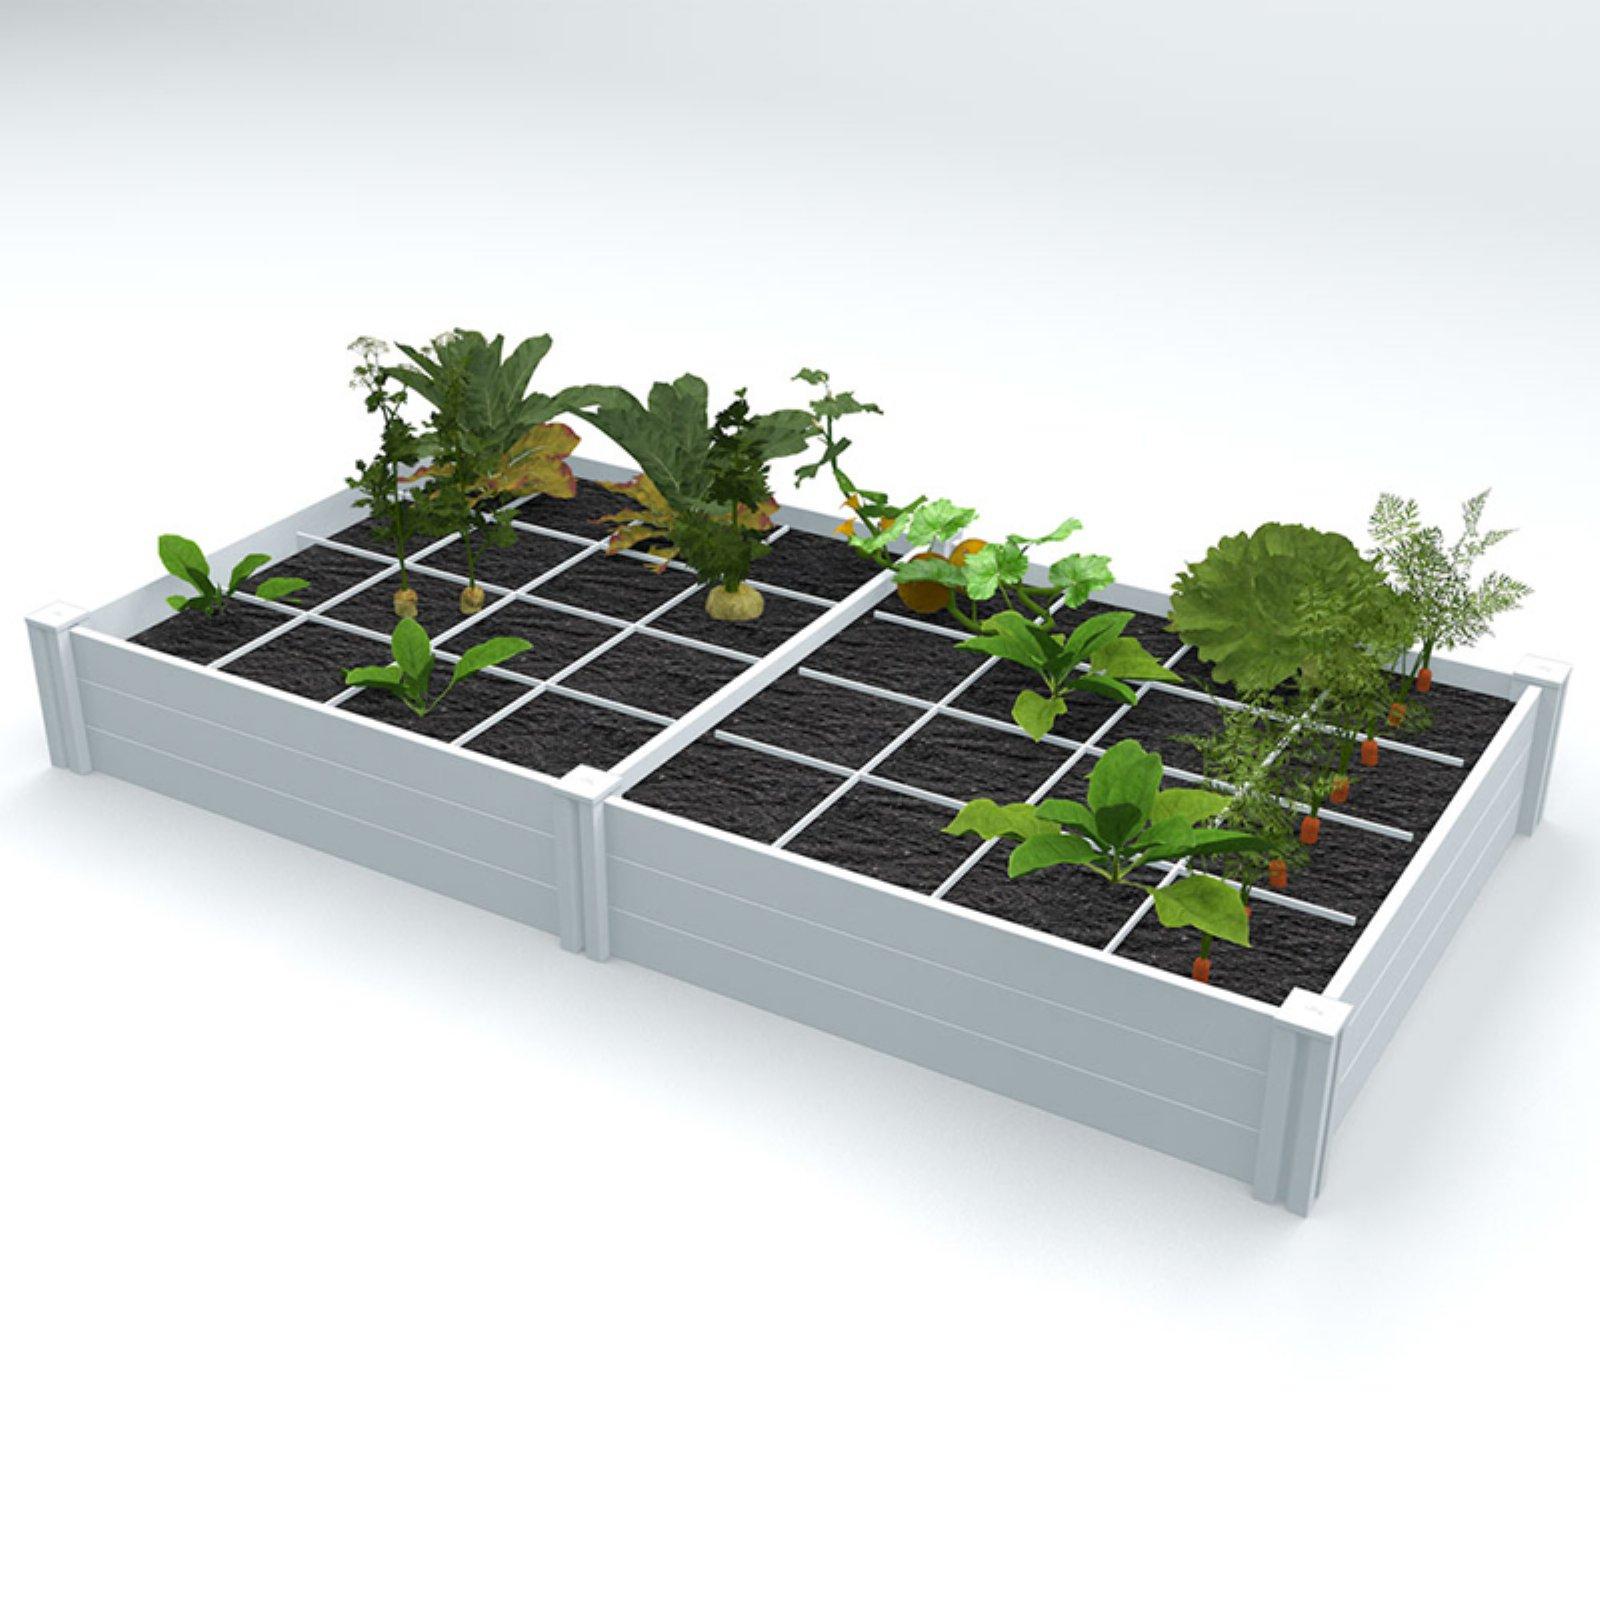 Belham Living 4 x 8 ft. Raised Garden Bed with Grow Grid